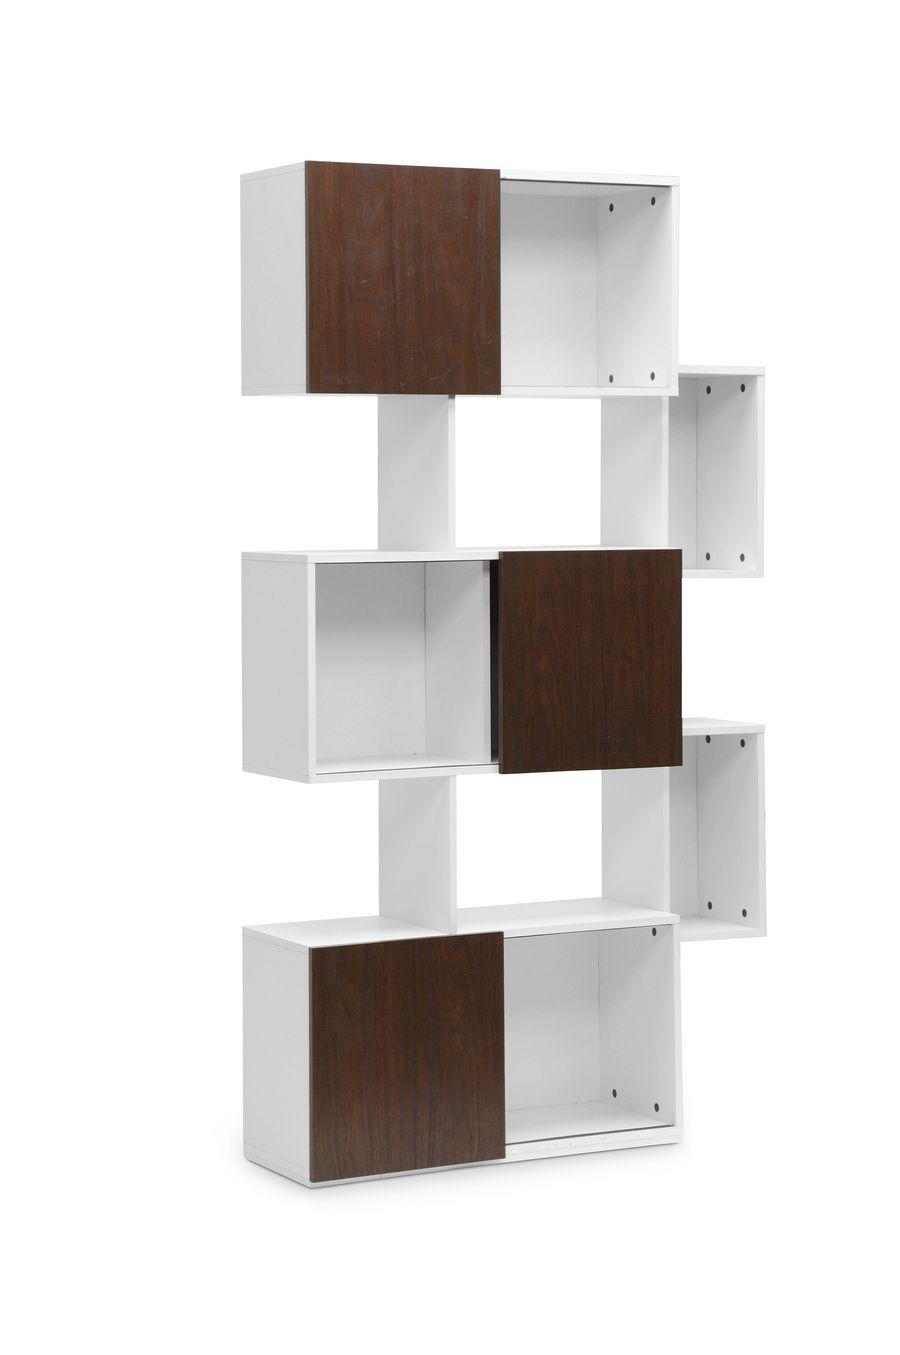 Chateau bookcase walnut leaning bookcase white modern bookcase walnut - Harriette White And Walnut Modern Bookshelf